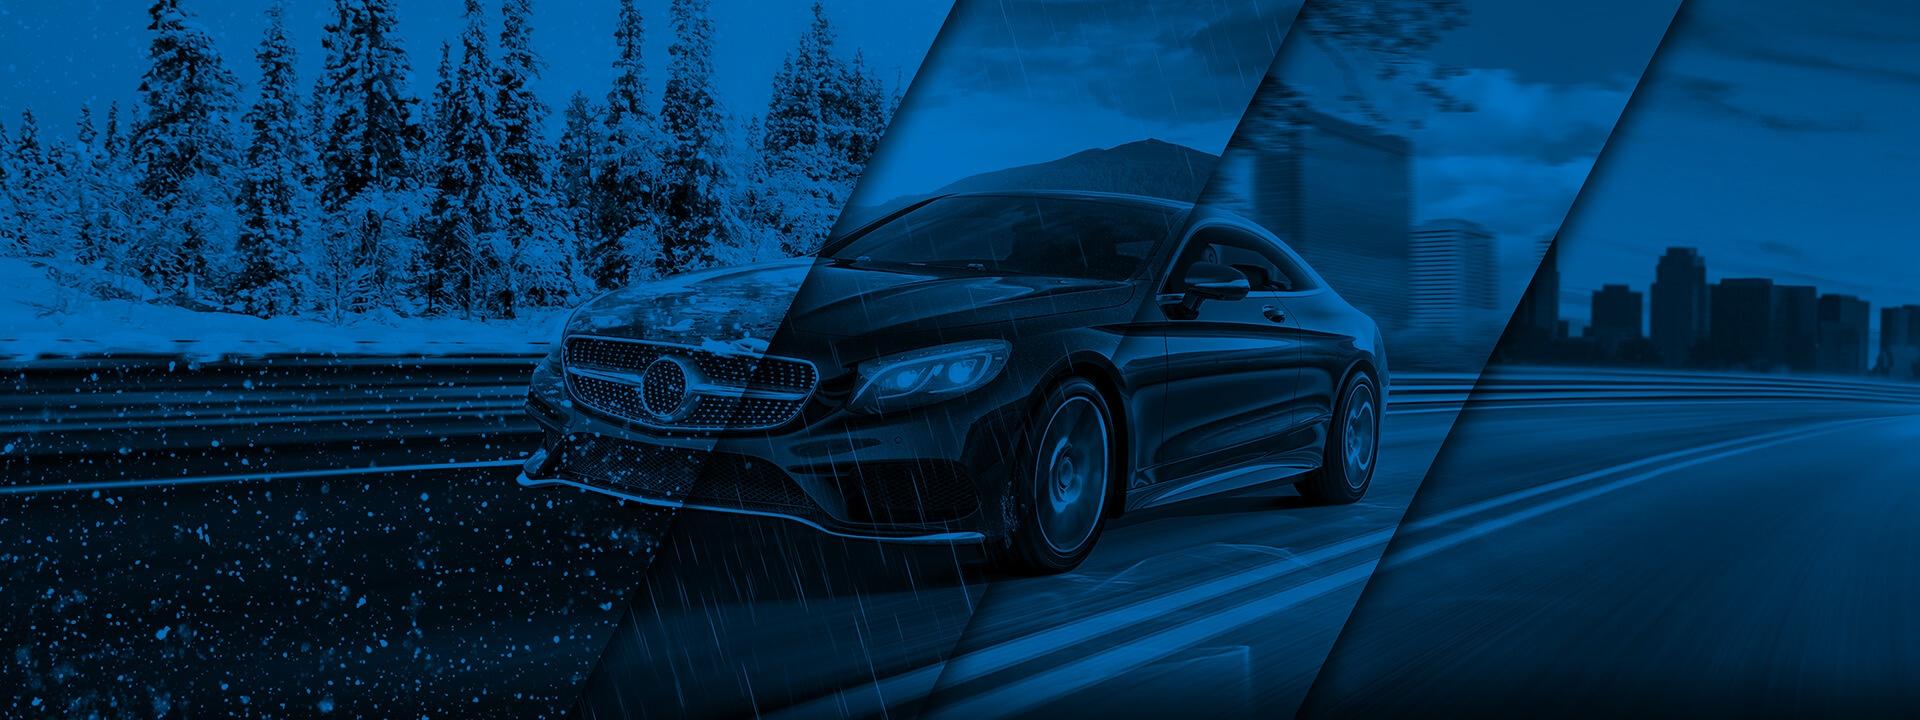 Rain-X Incentive Program for professional Car Washes